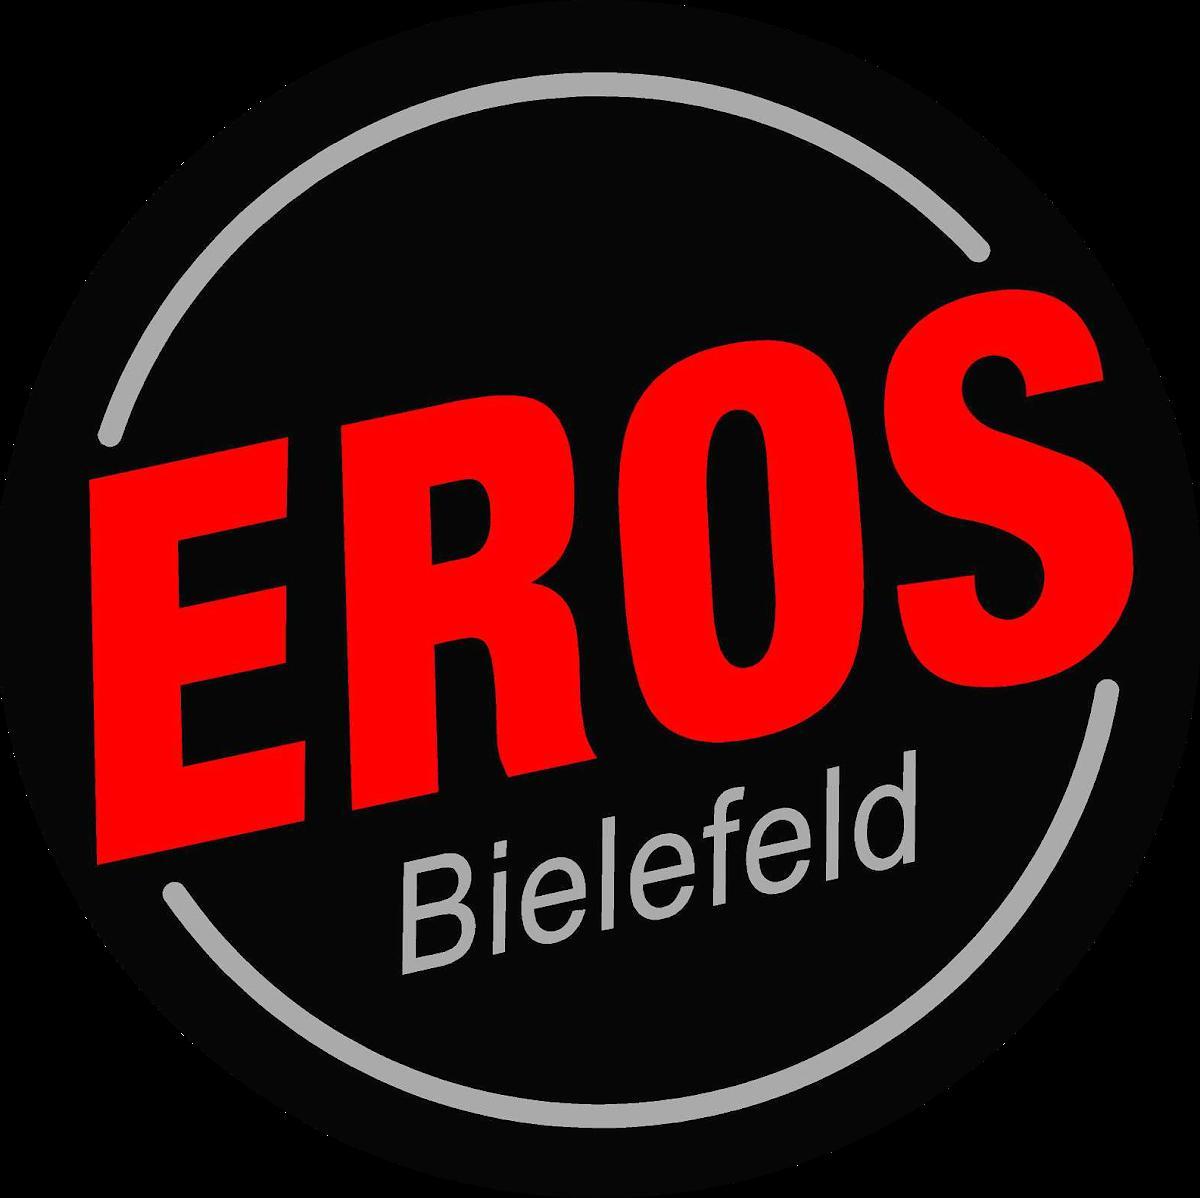 Bielefeld eros Betaine lipids